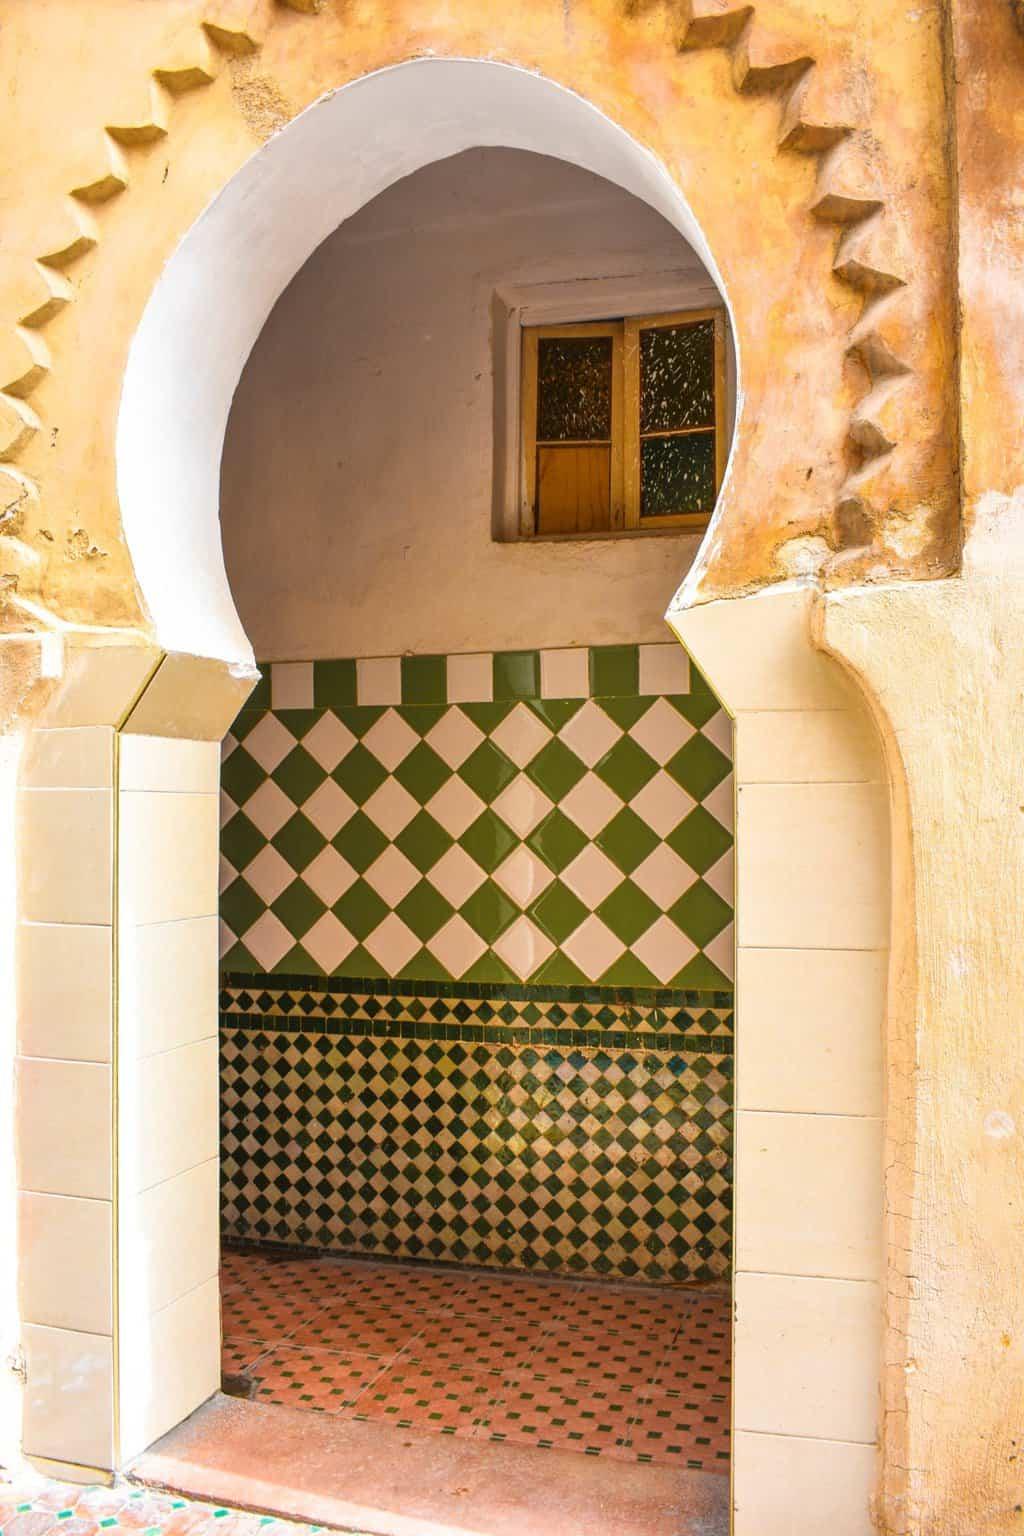 experiencing a hammam in Morocco